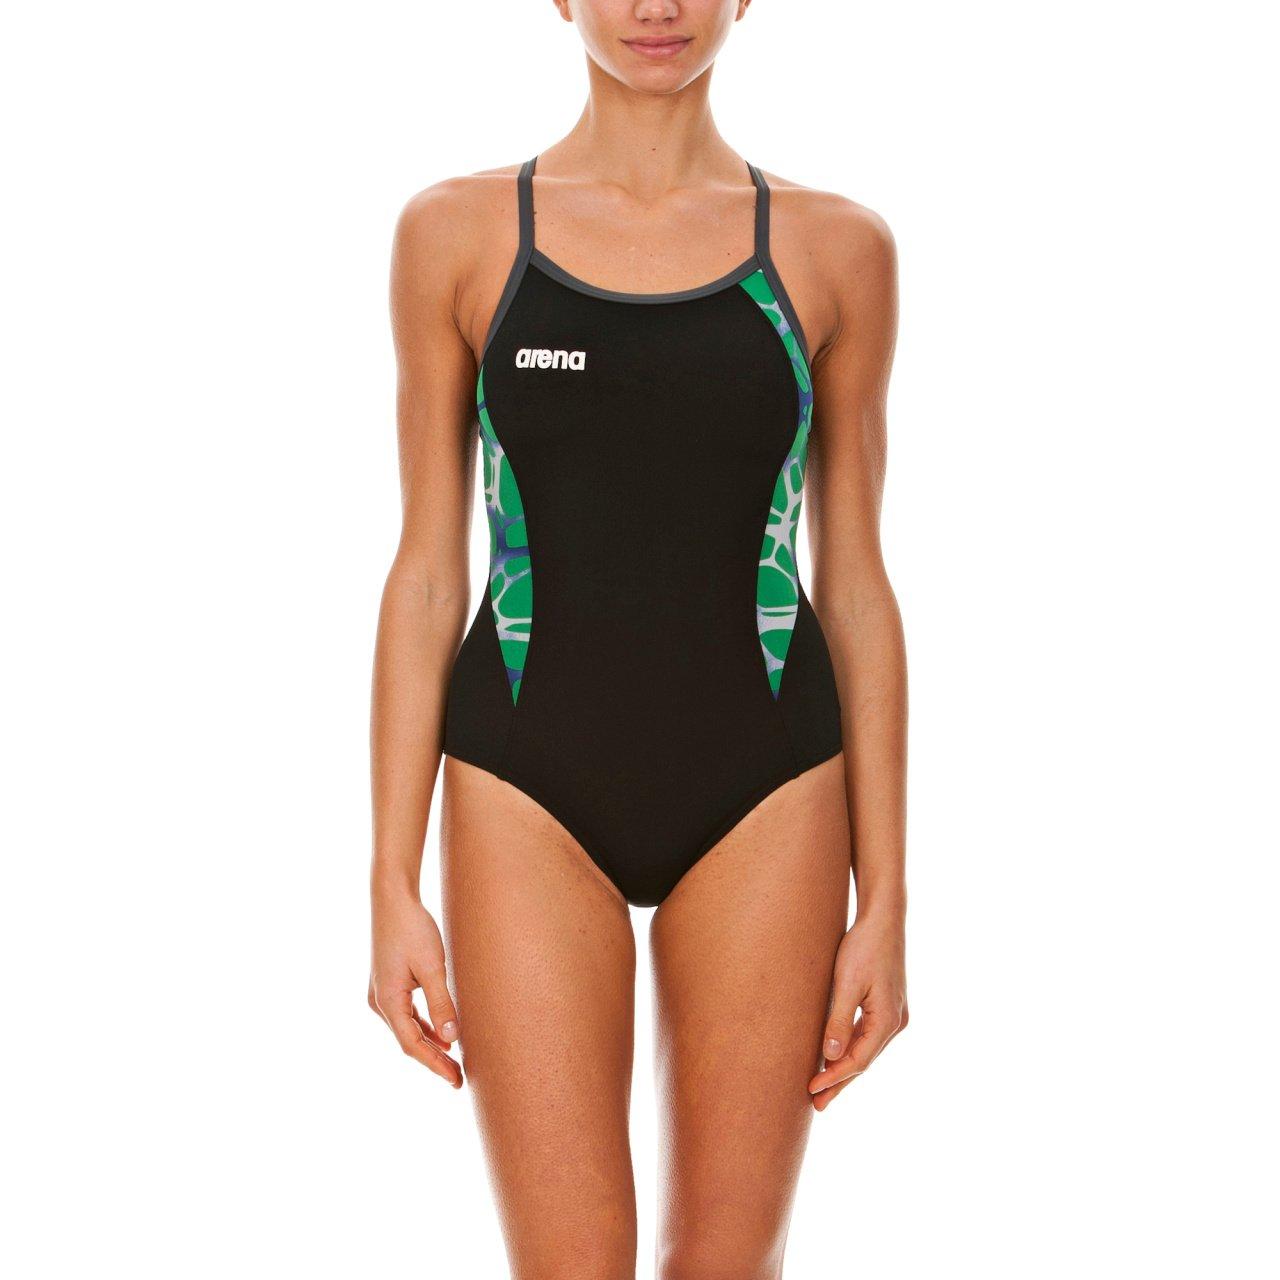 ArenaレディースCarbonite One Piece Swimsuit B00SLYVEMK 28 Black/Asphalt/Kelly Green